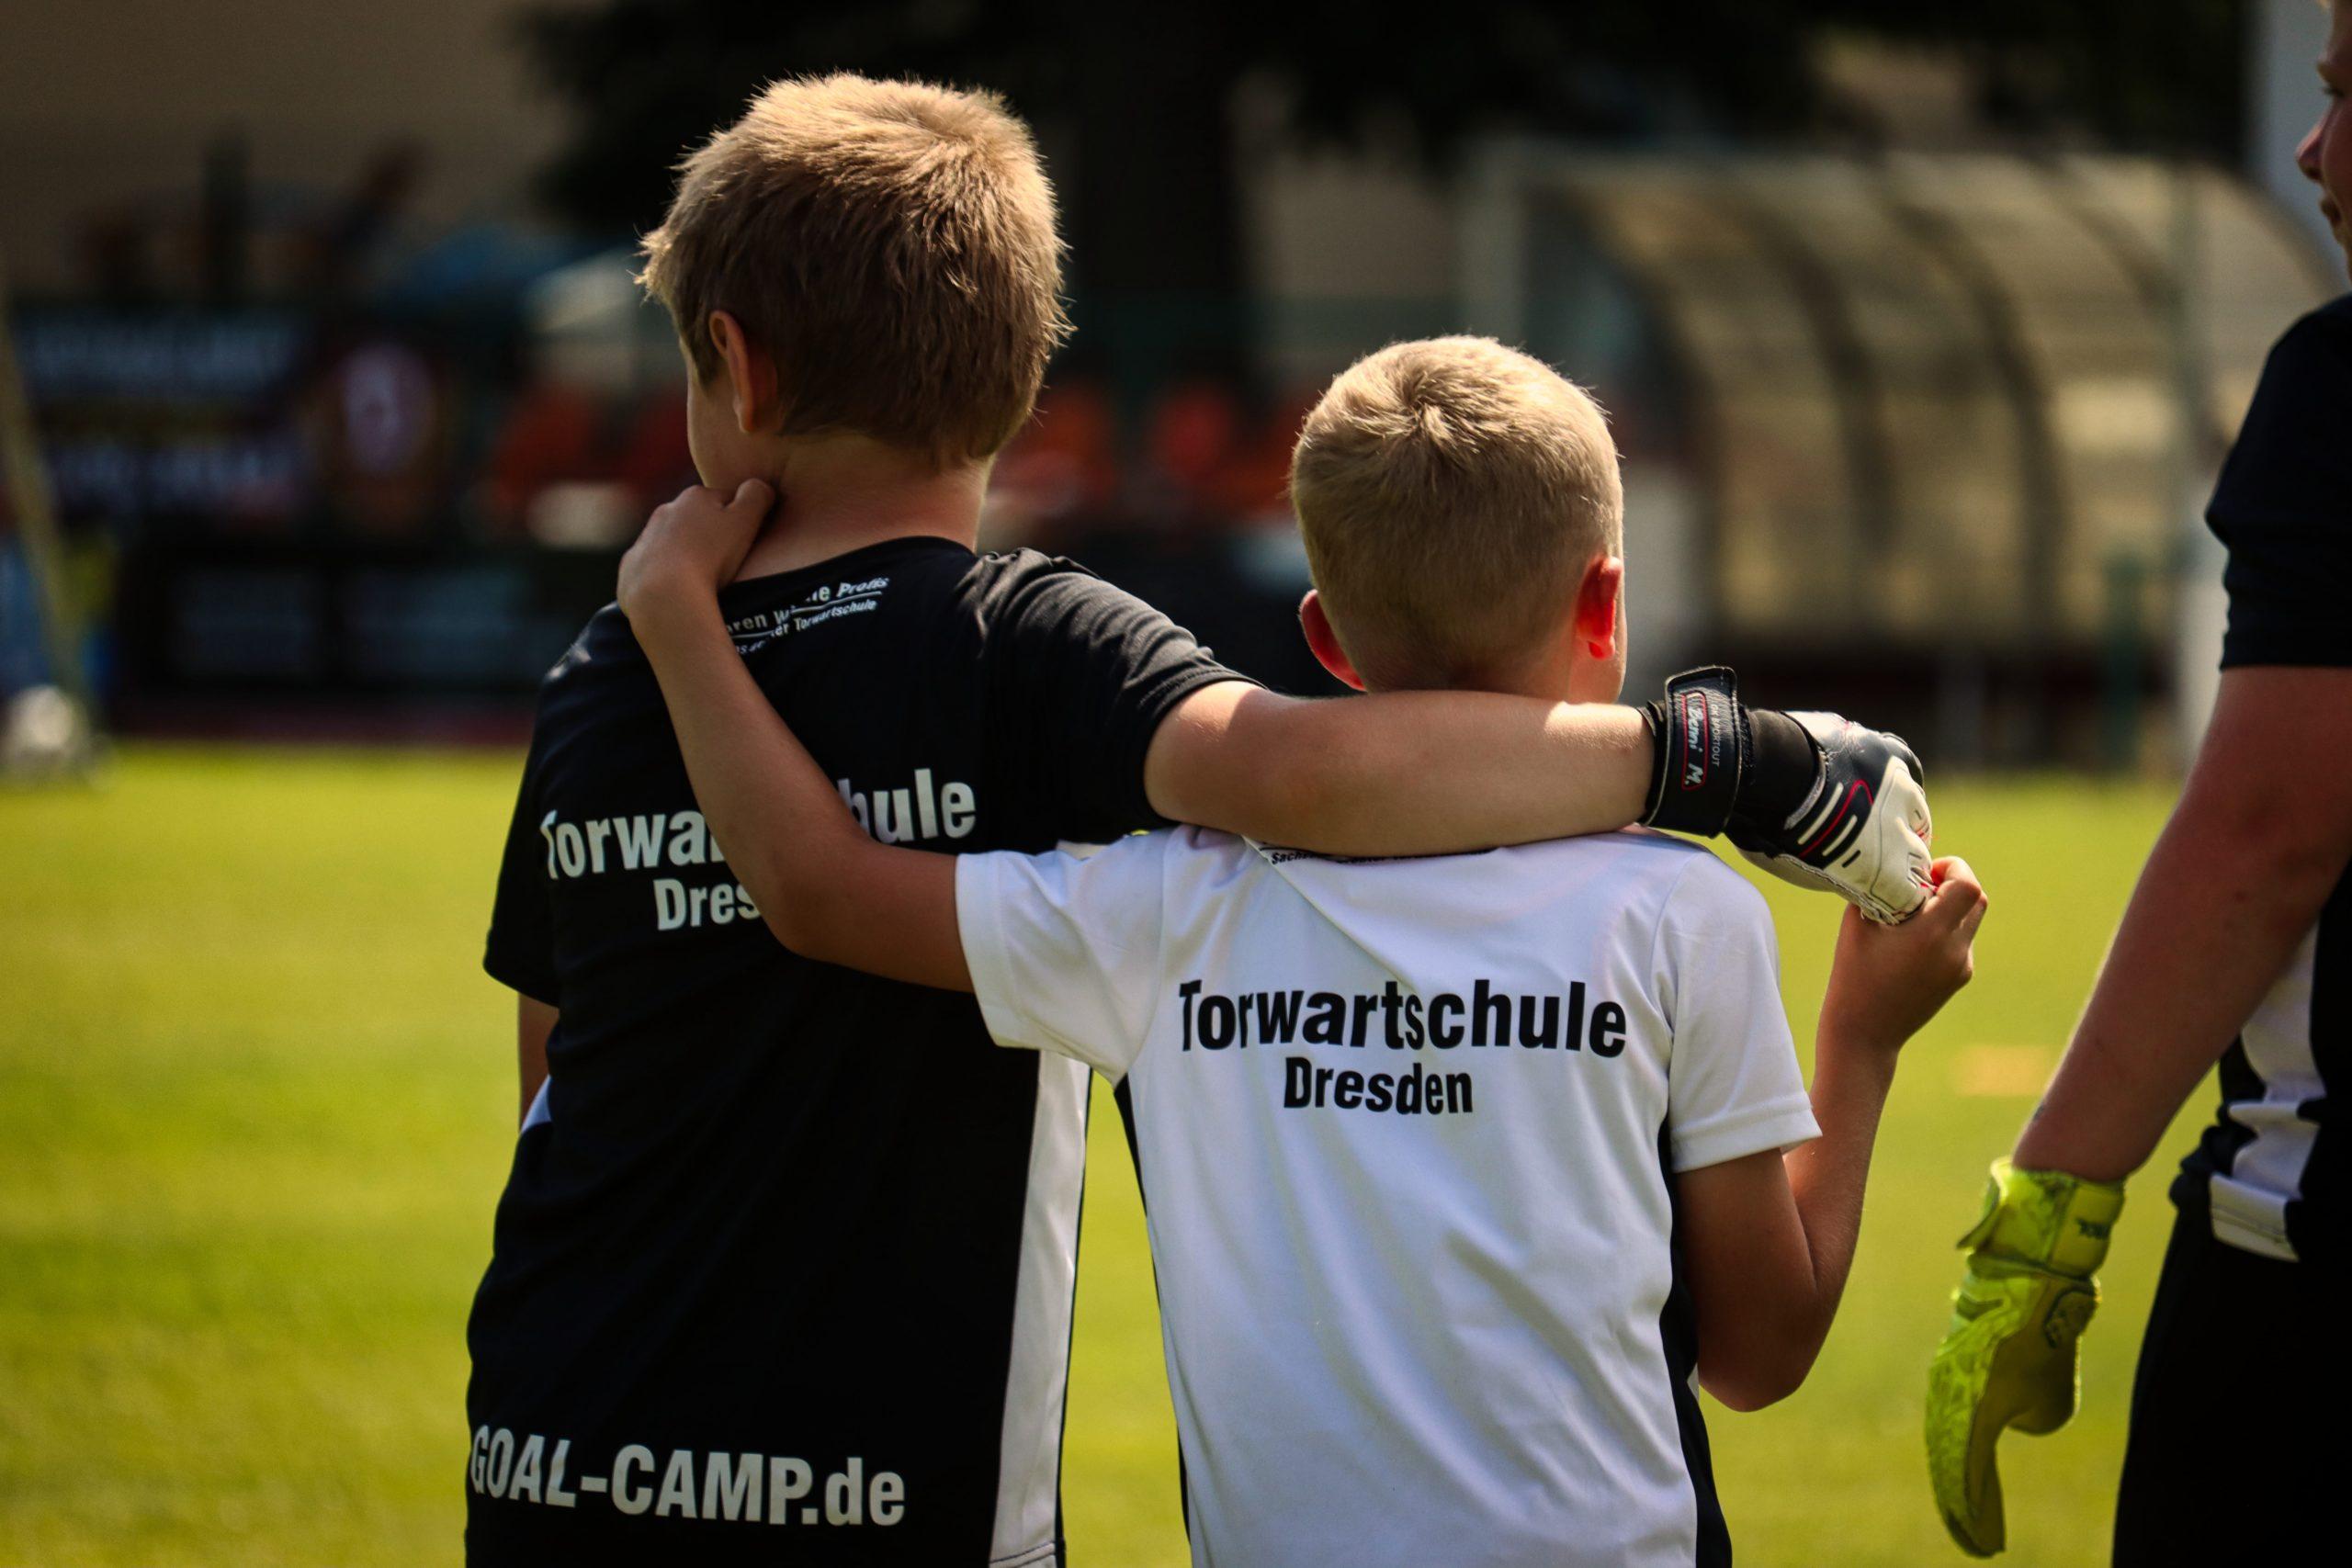 Vereins-Training Torwartschule Dresden